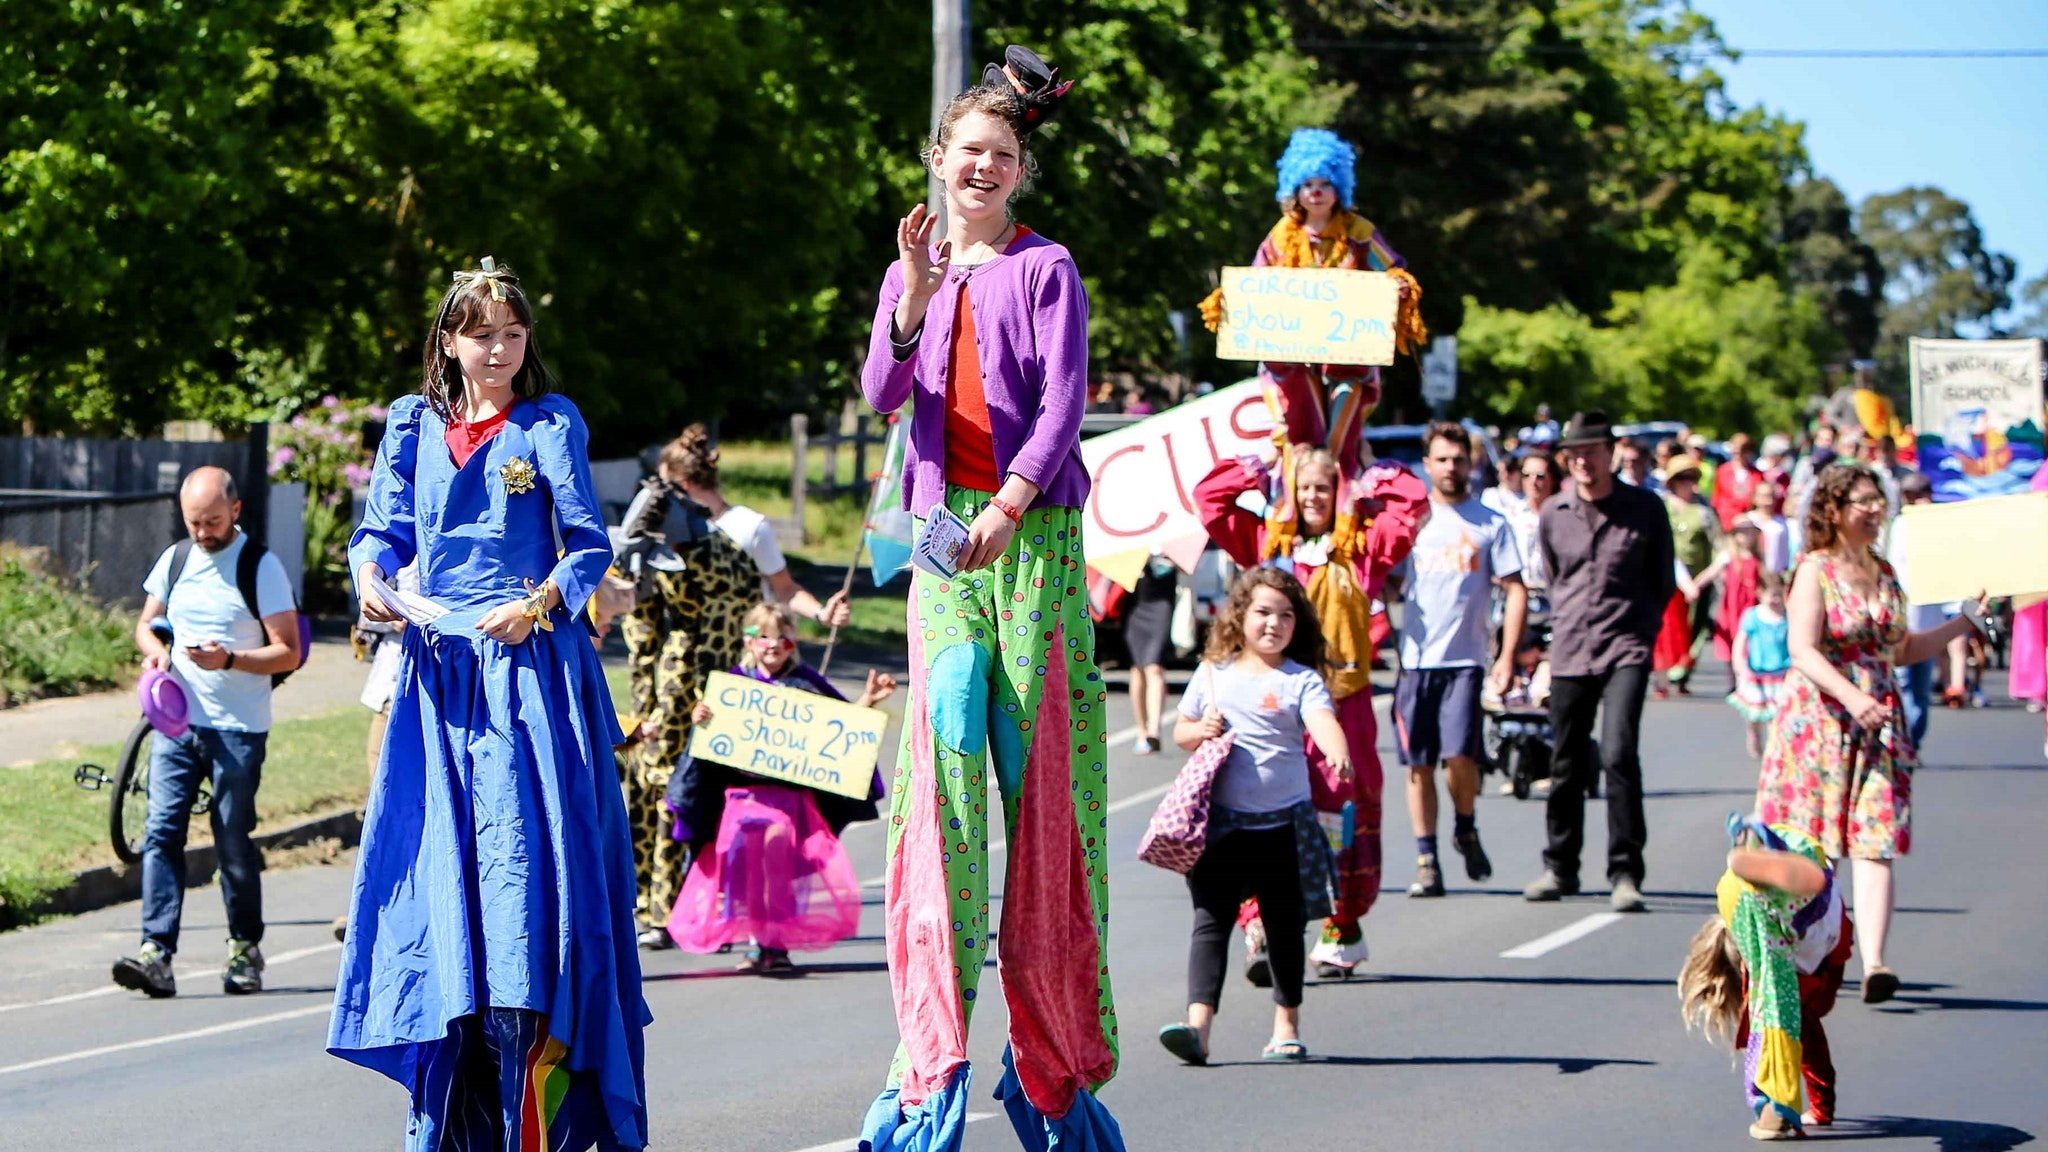 Students on stilts lead the parade to the Hepburn Springs Swiss Italian Festa Family Festa Day